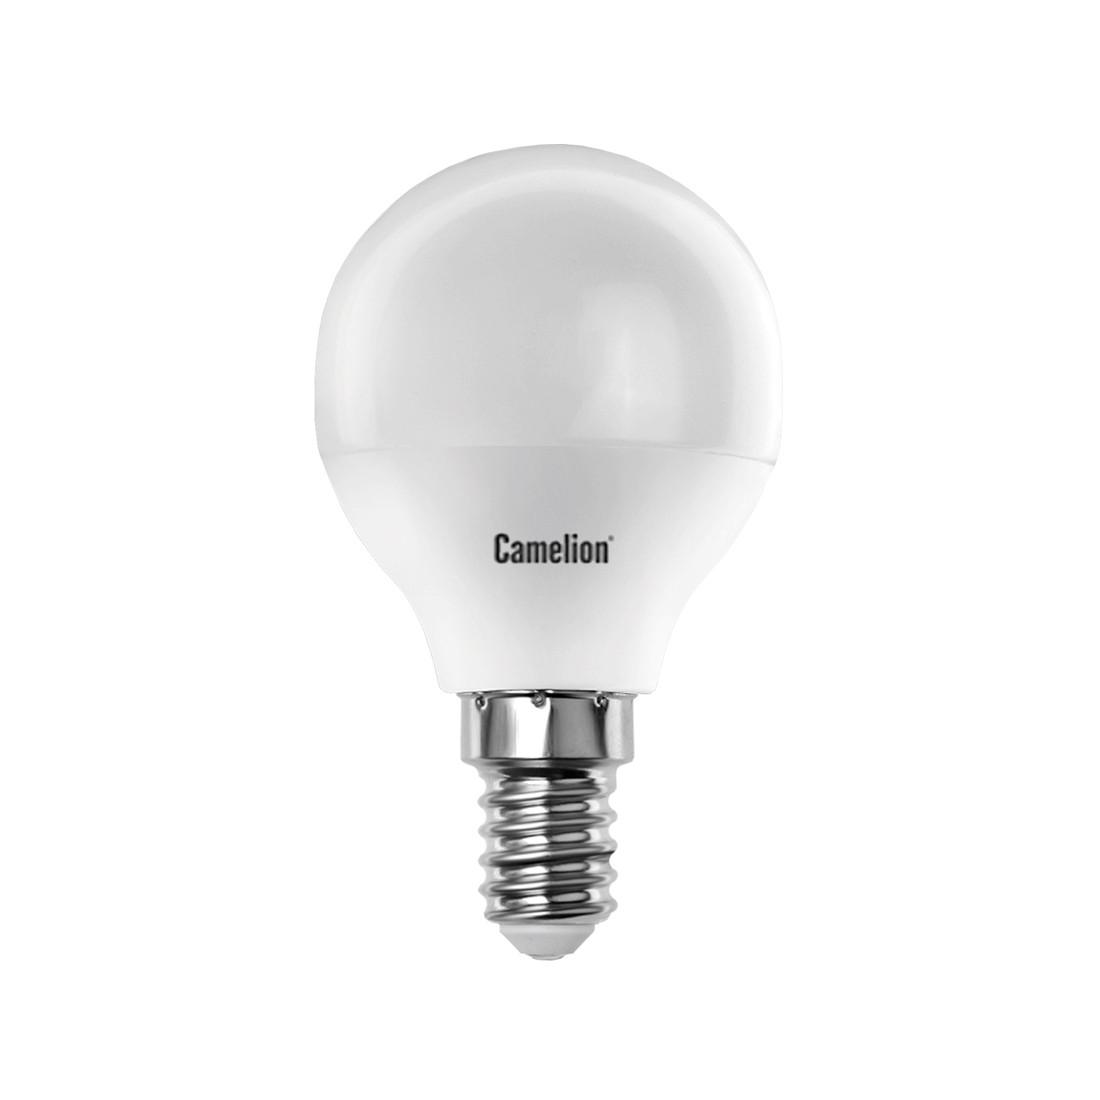 Эл. лампа светодиодная Camelion LED7-G45/845/E14, Холодный